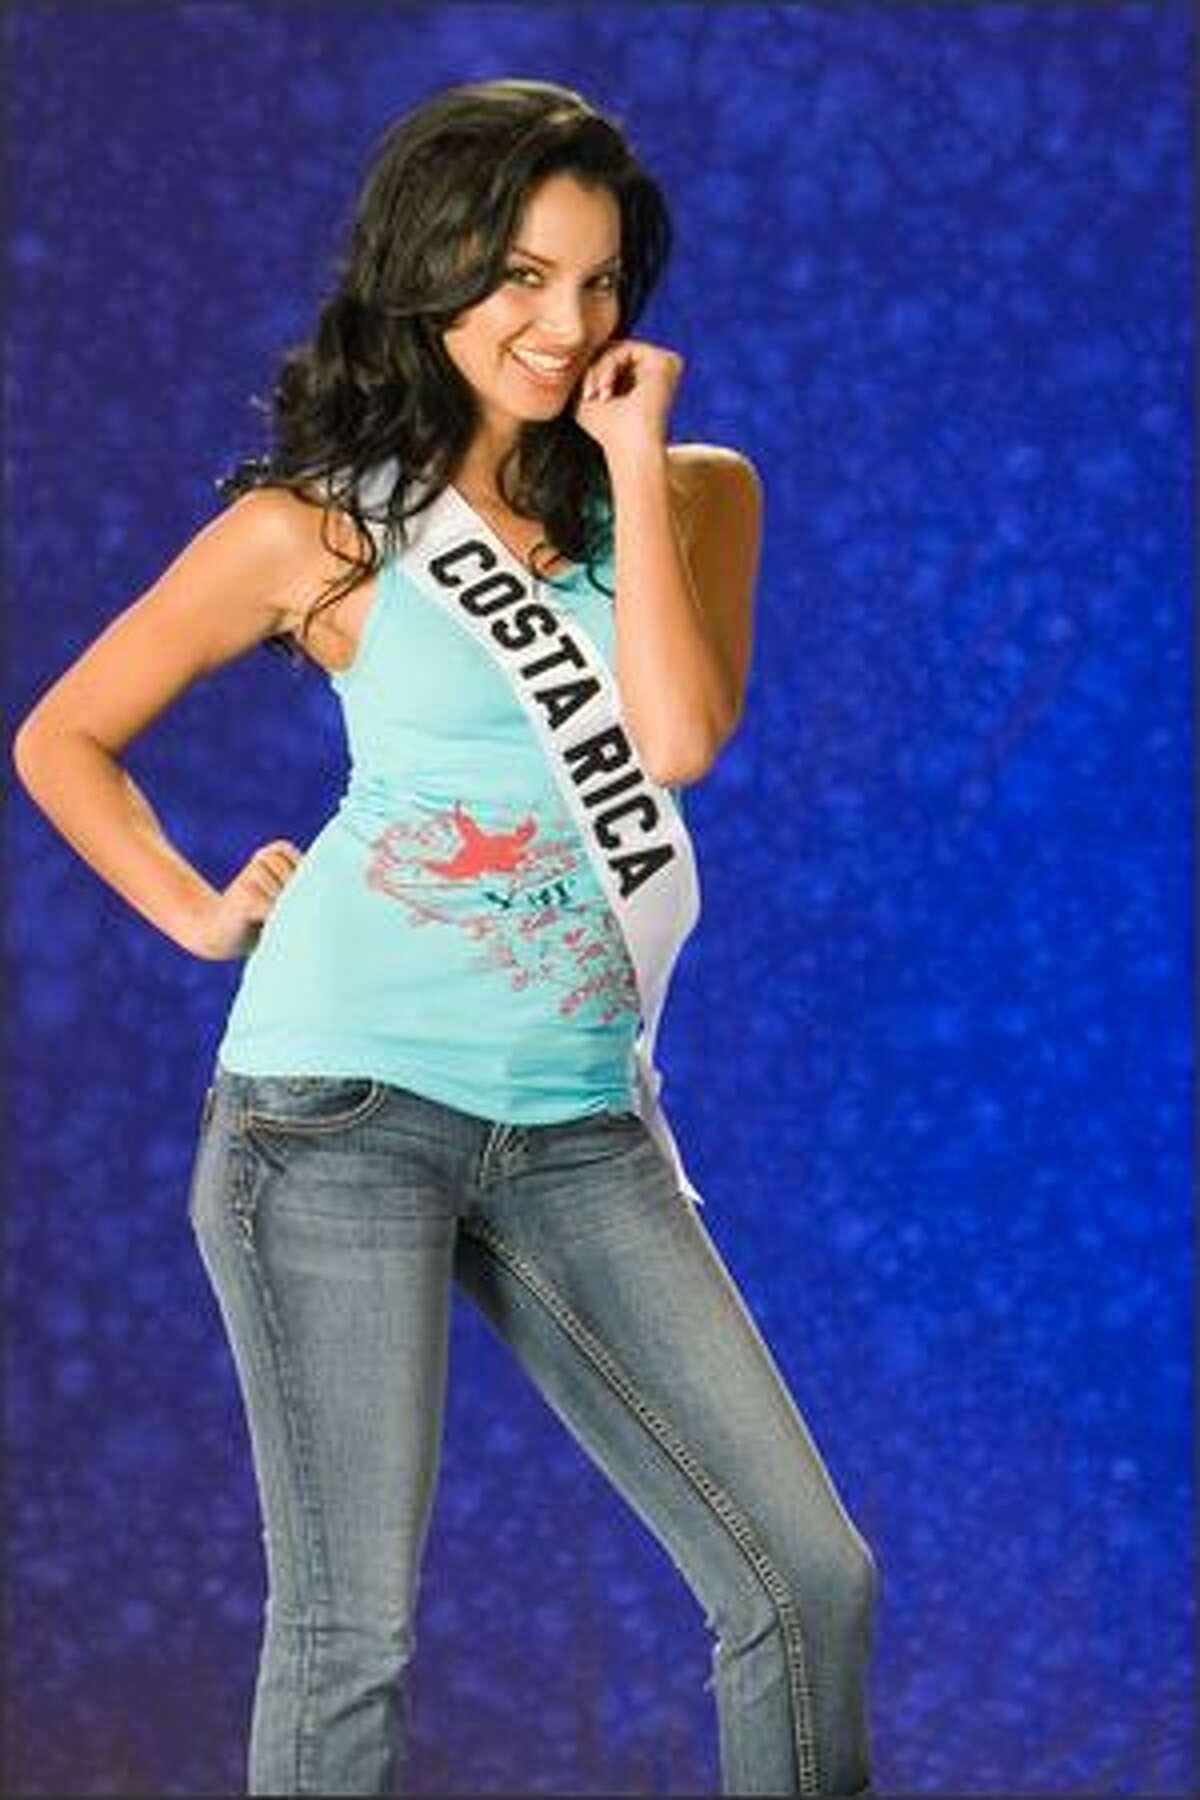 Veronica Gonzalez, Miss Costa Rica 2007.